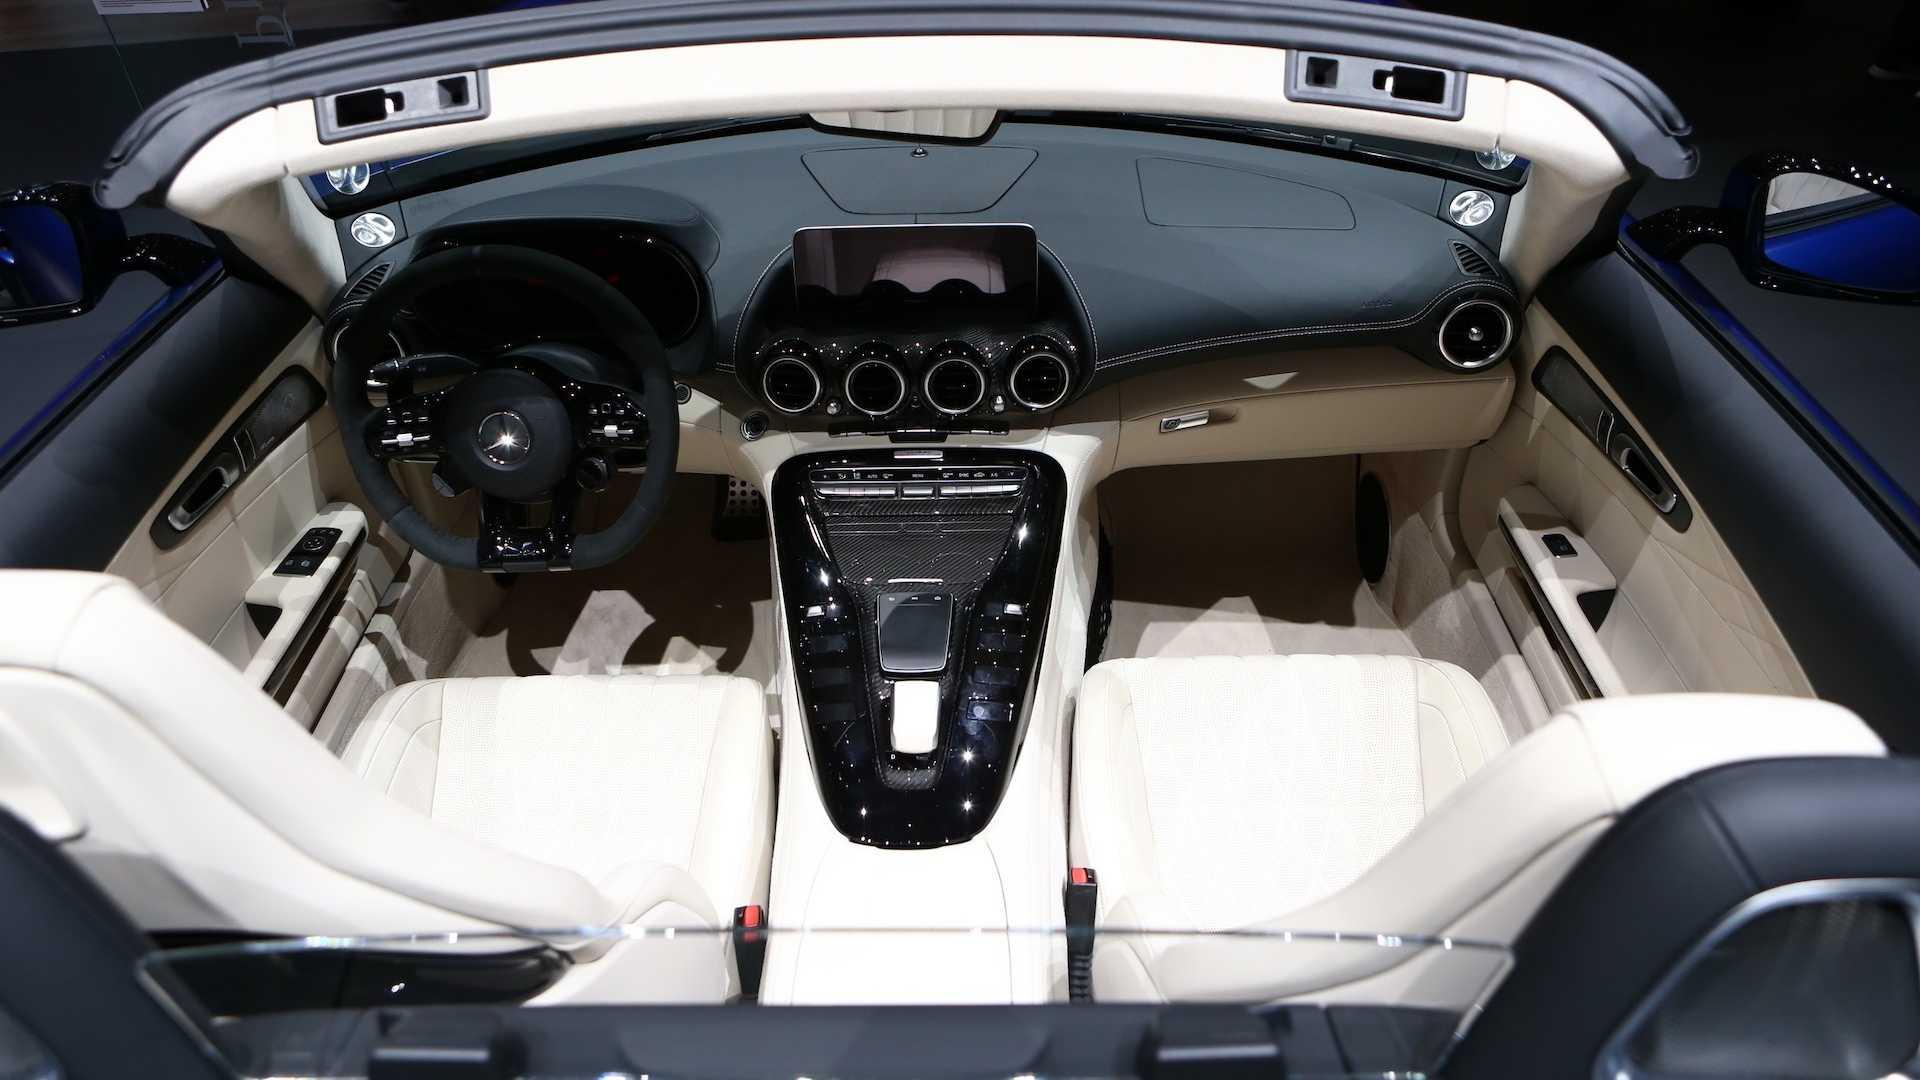 mercedes-amg-gt-r-roadster-4.jpg